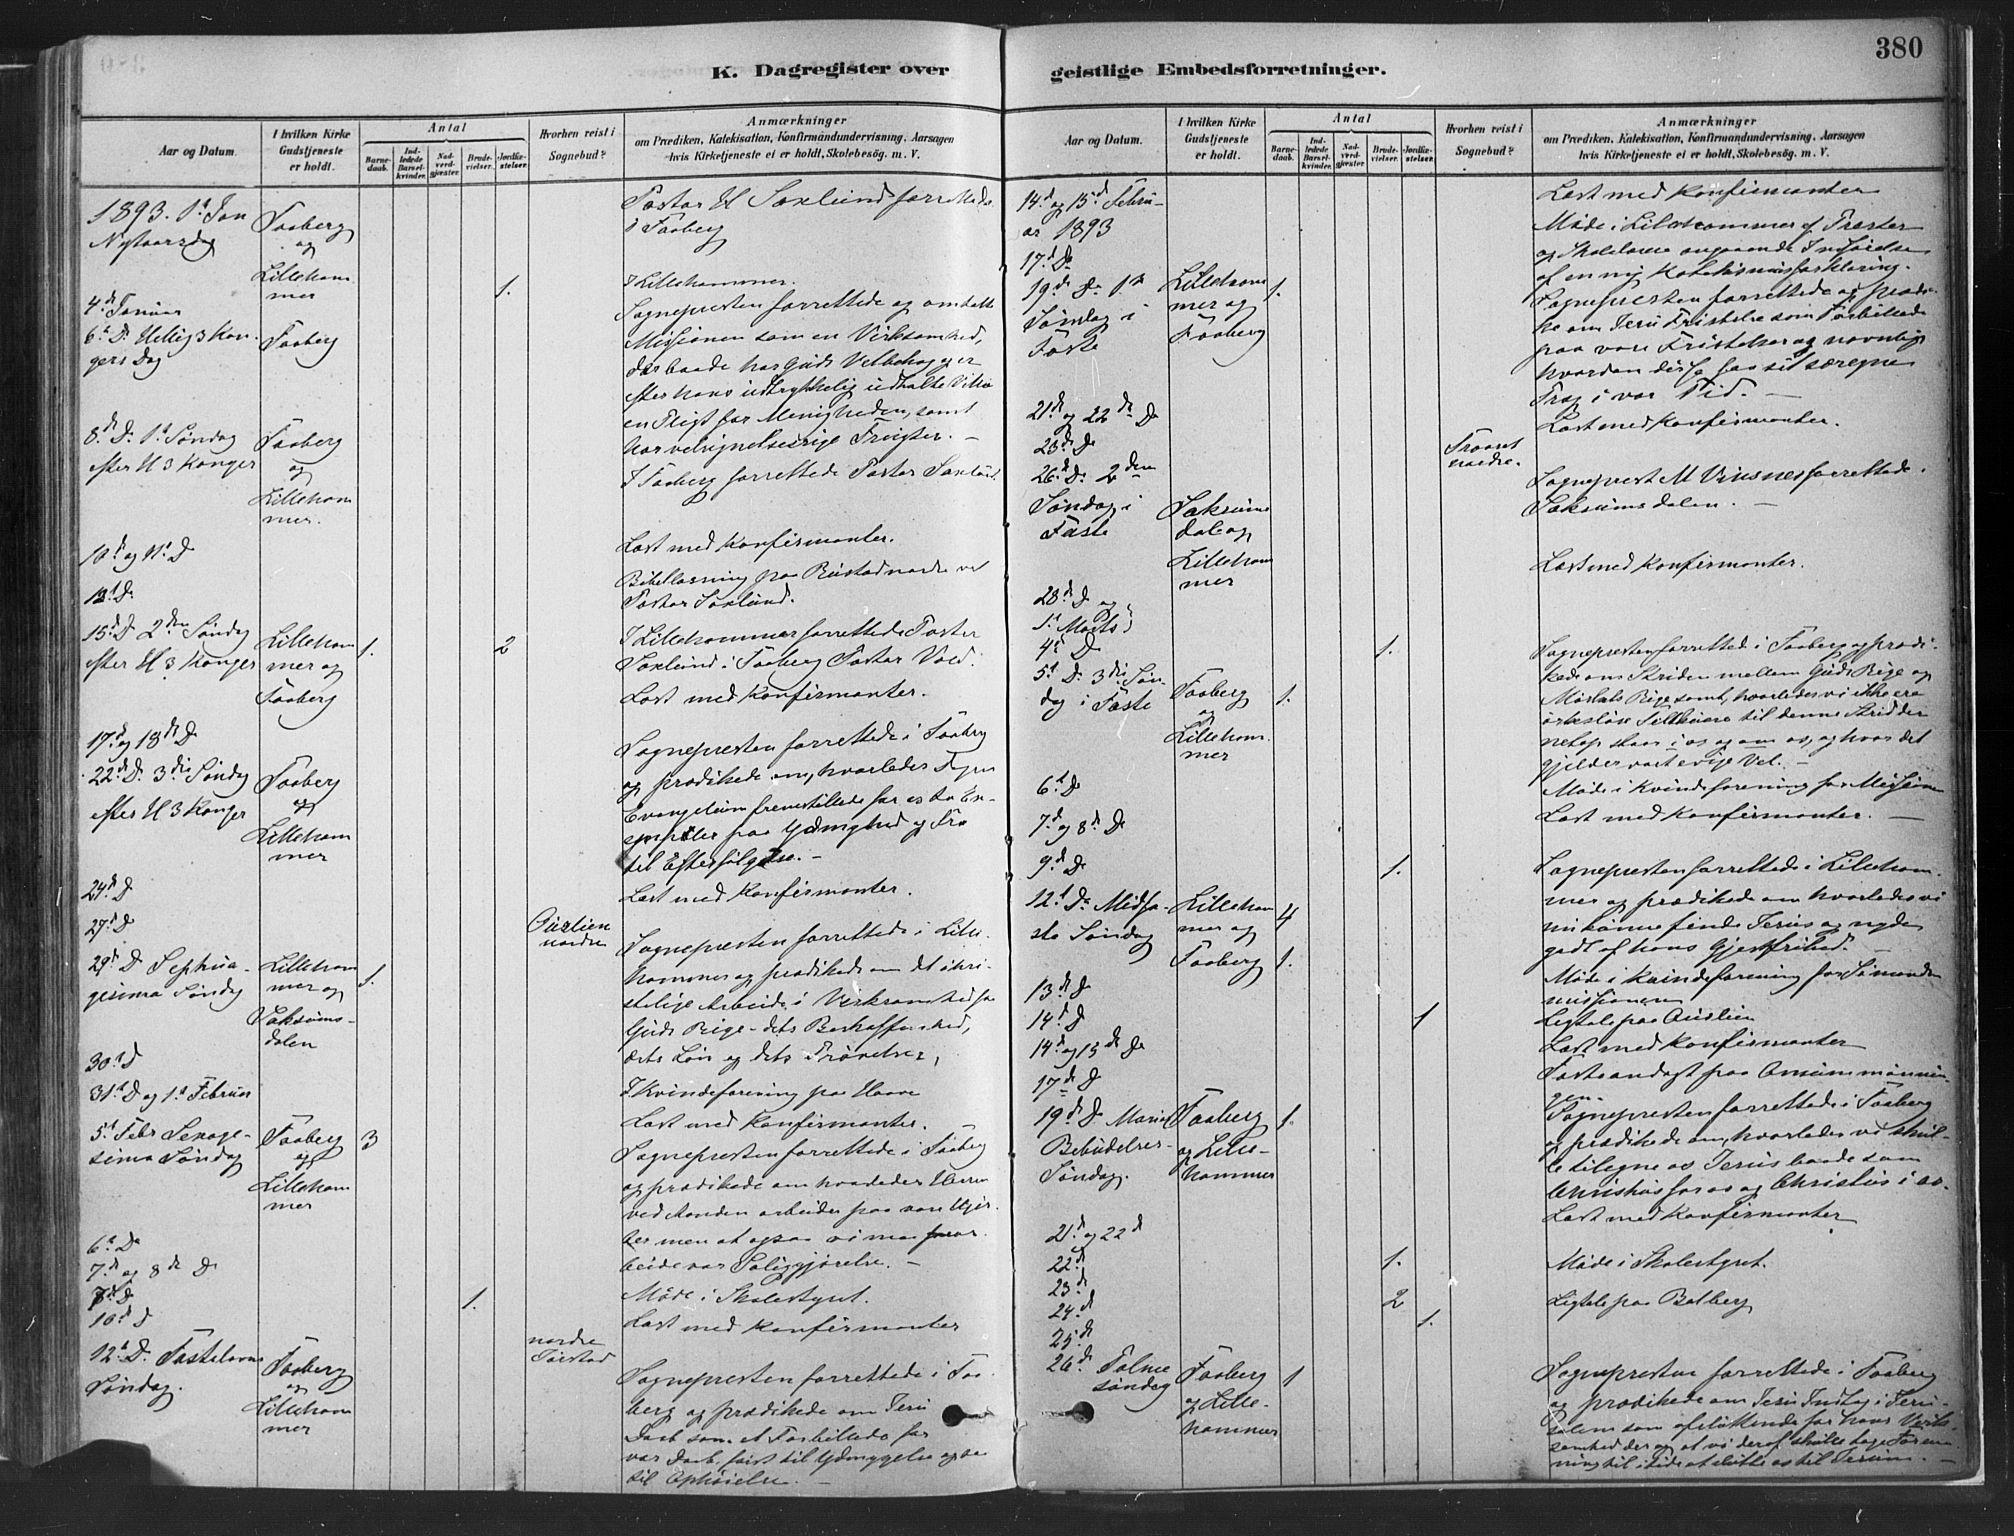 SAH, Fåberg prestekontor, H/Ha/Haa/L0010: Parish register (official) no. 10, 1879-1900, p. 380